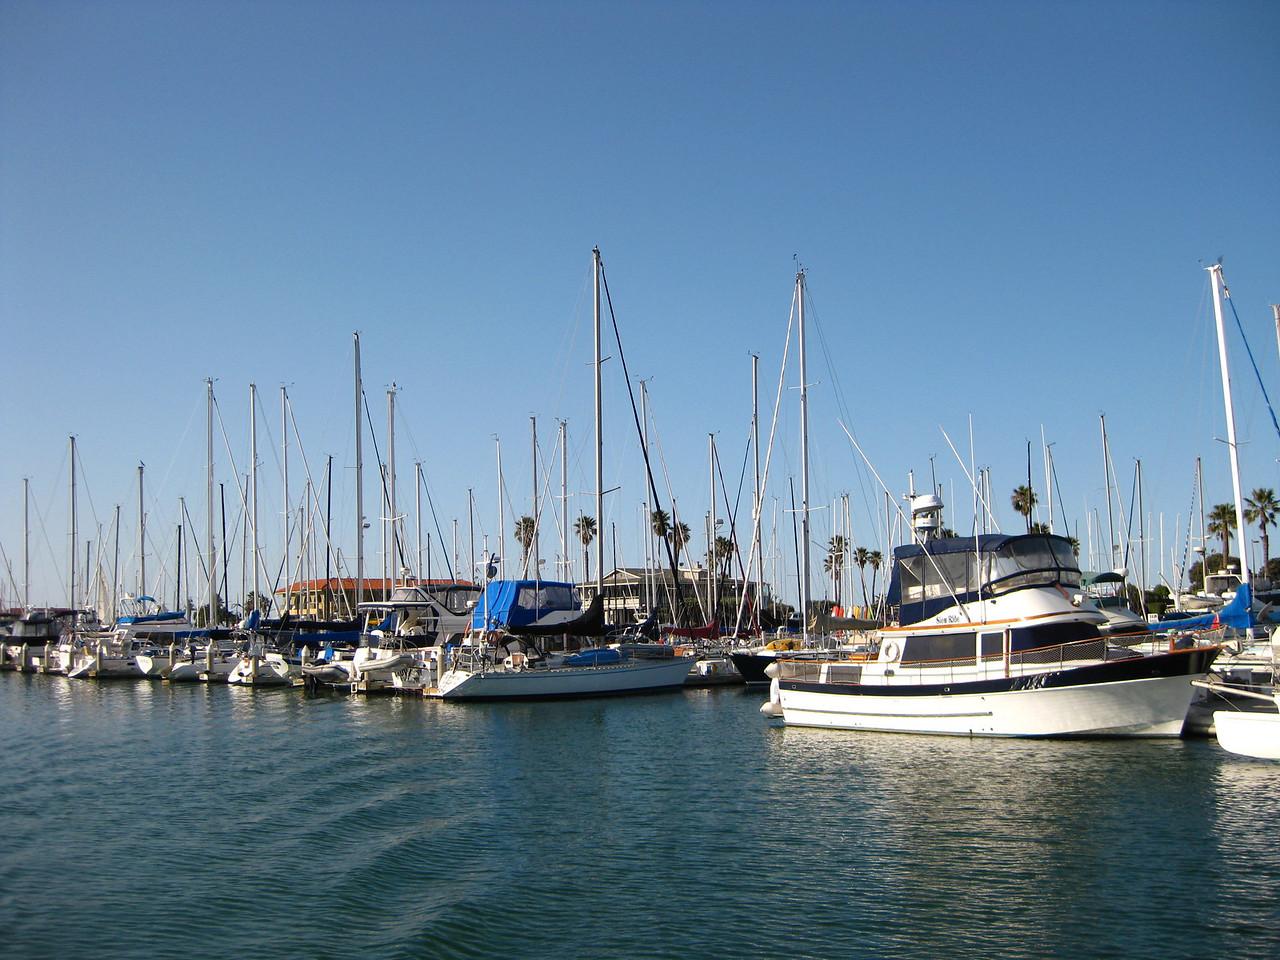 Leaving Ventura Harbor